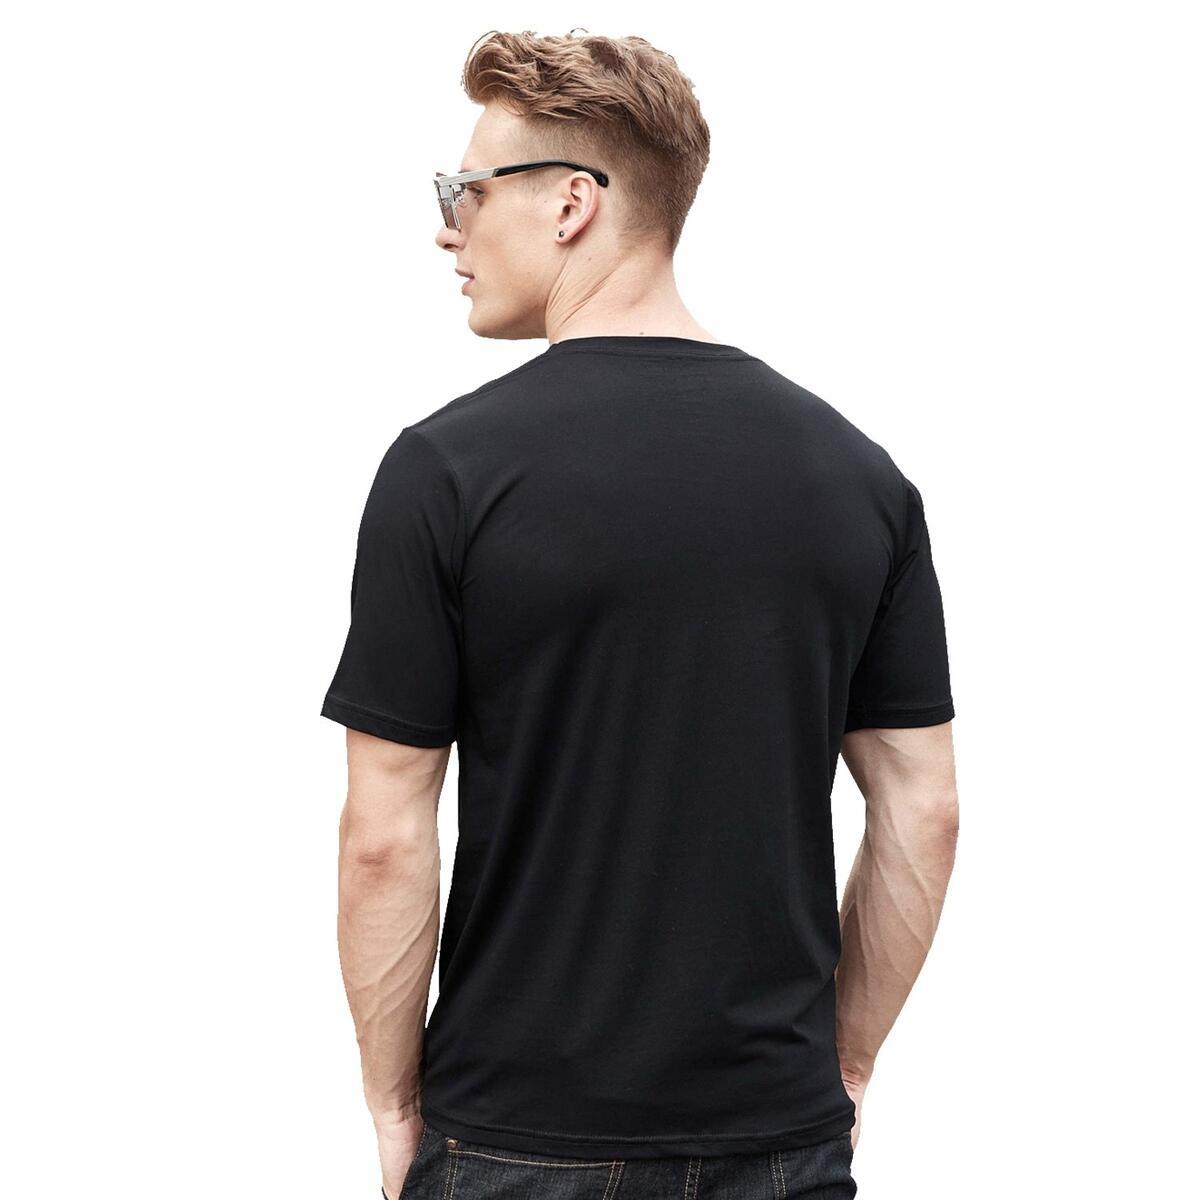 Animal Crossing Tom Crook Money Bags Shirt, Dark Grey / S